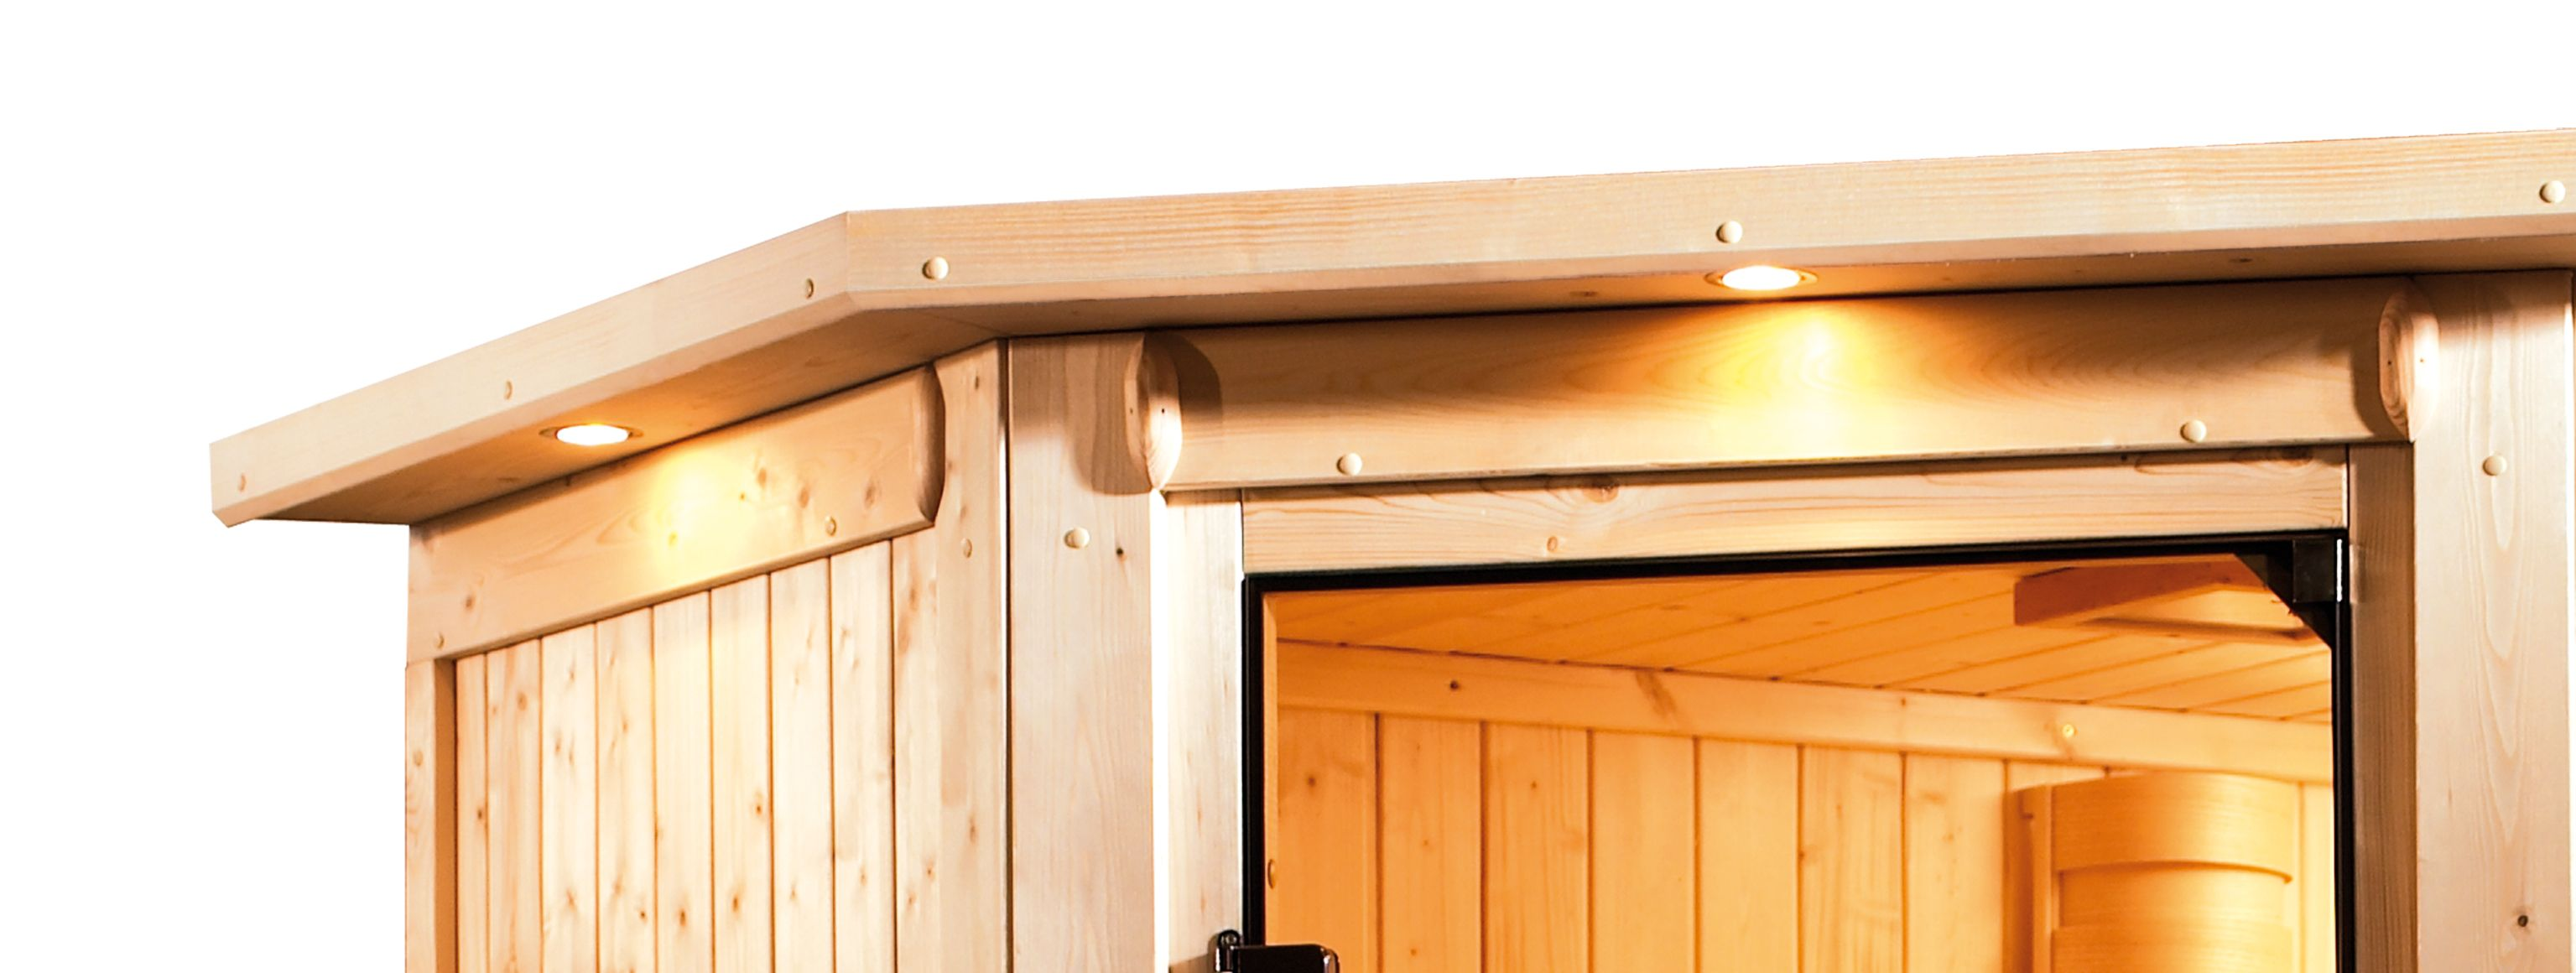 Woodfeeling Sauna Lisa 38mm Kranz Ofen Bio 9kW Tür Klarglas Bild 12